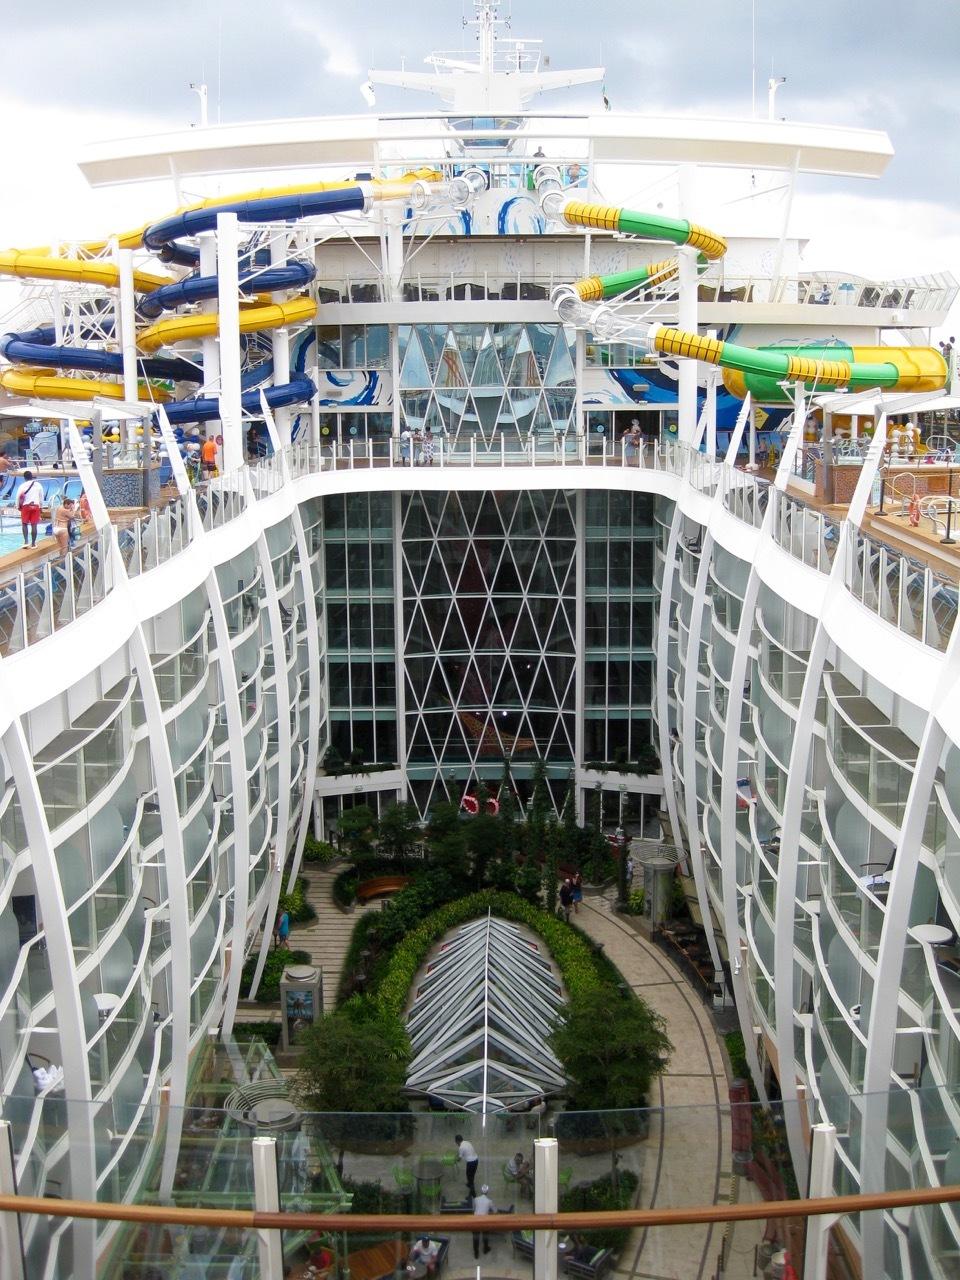 Harmony Of The Seas Sailed 4 22 17 Boardwalk Harmony Of The Seas Cruise Review